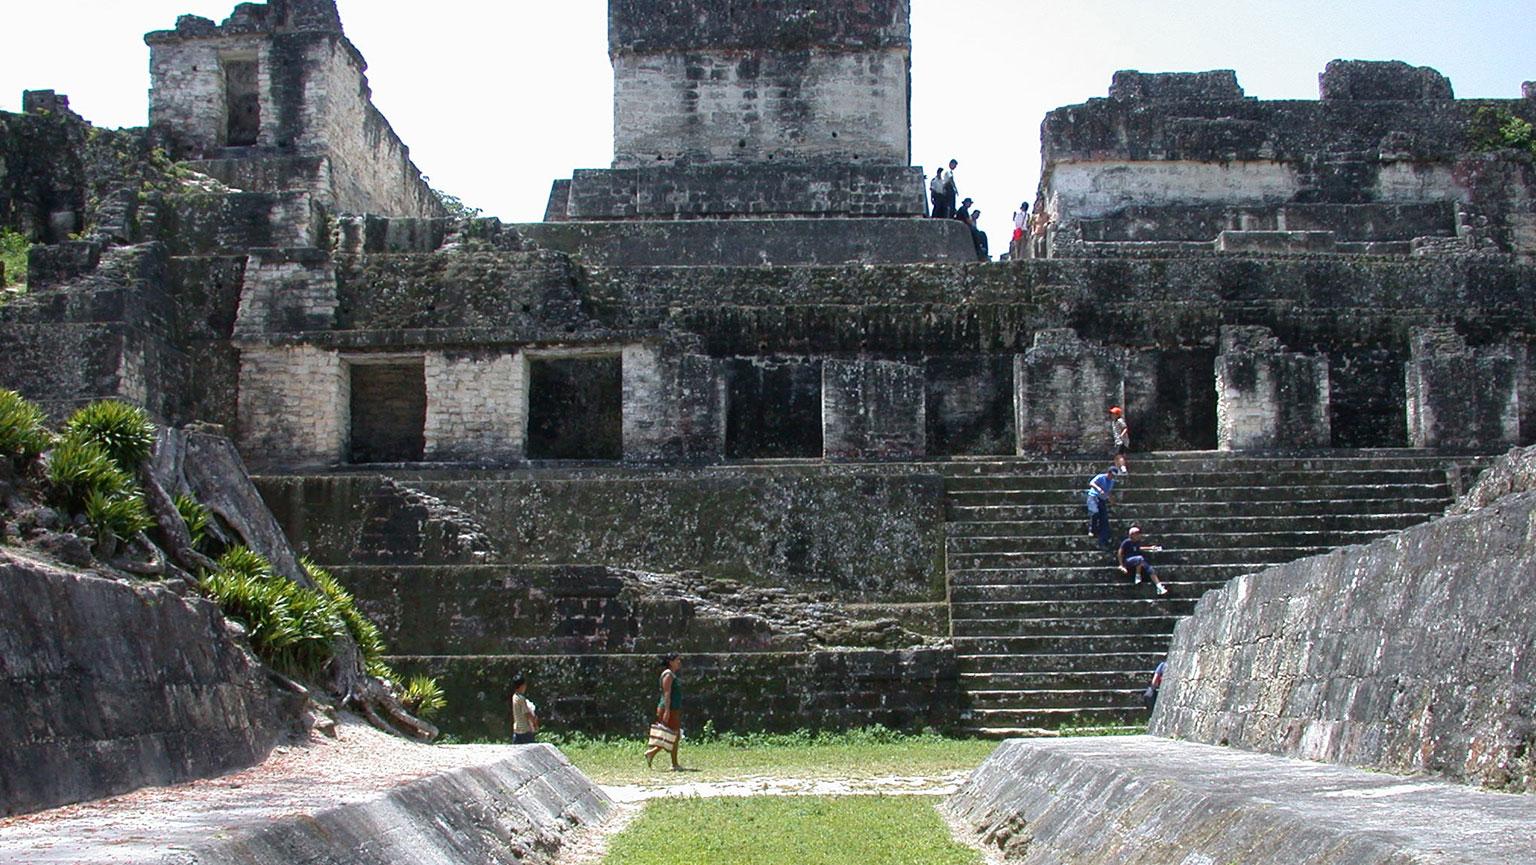 The Mesoamerican Ball Game